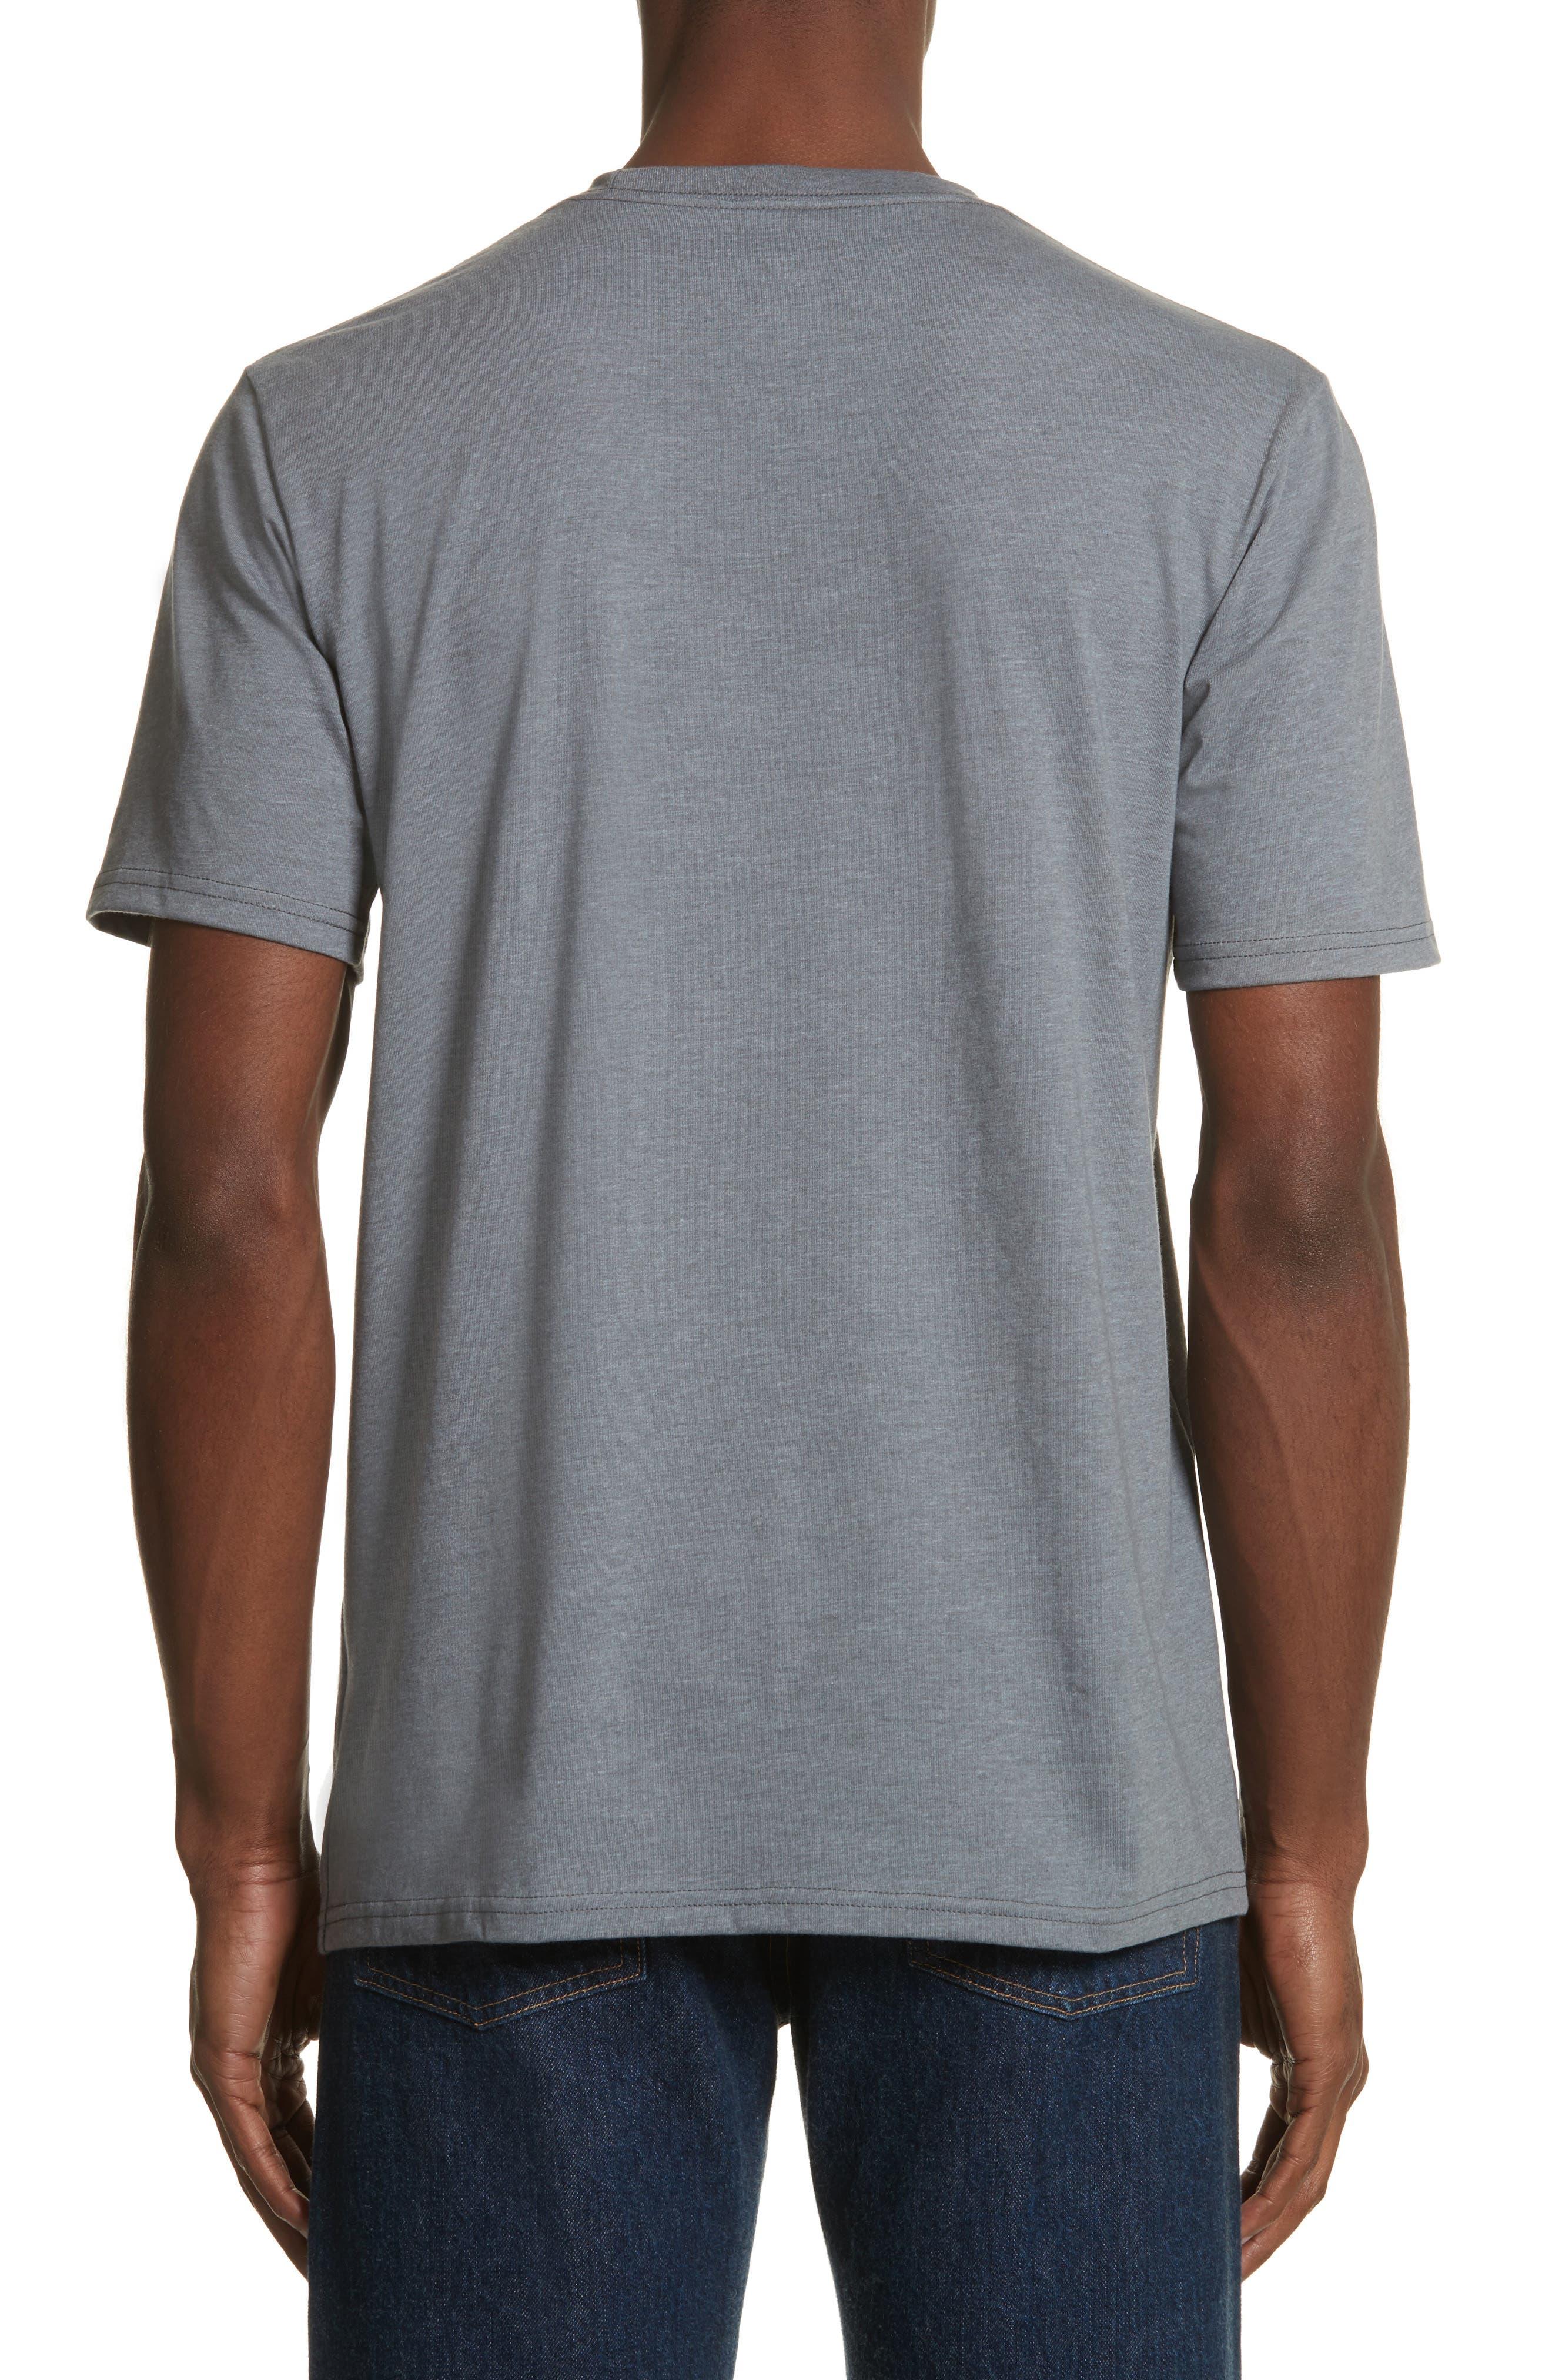 Unisex Pocket T-Shirt,                             Alternate thumbnail 2, color,                             030